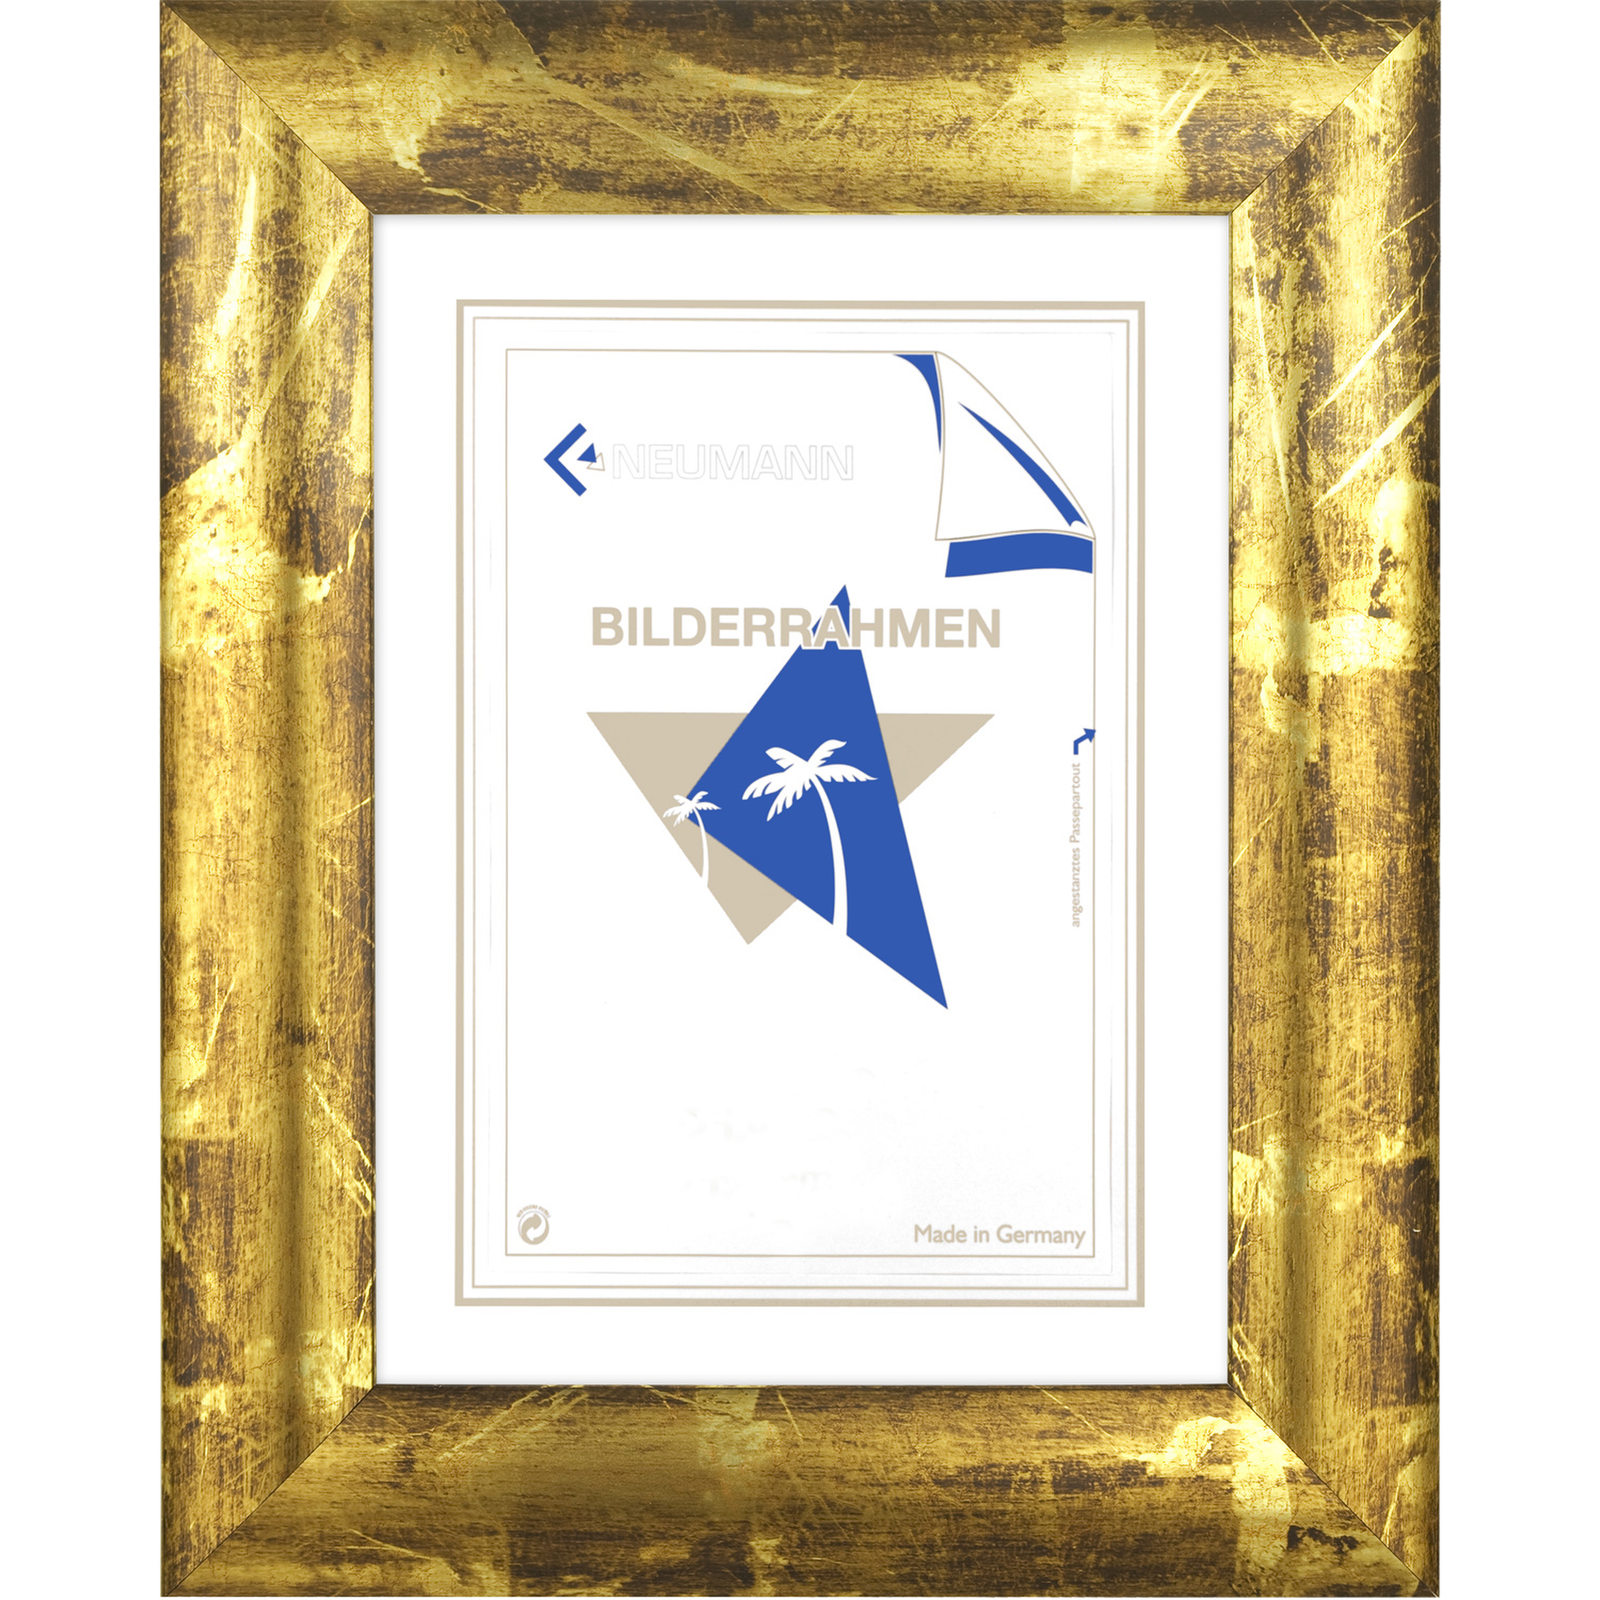 Kunststoffrahmen VERNISSAGE, 20 x 30 cm, silber matt | eBay